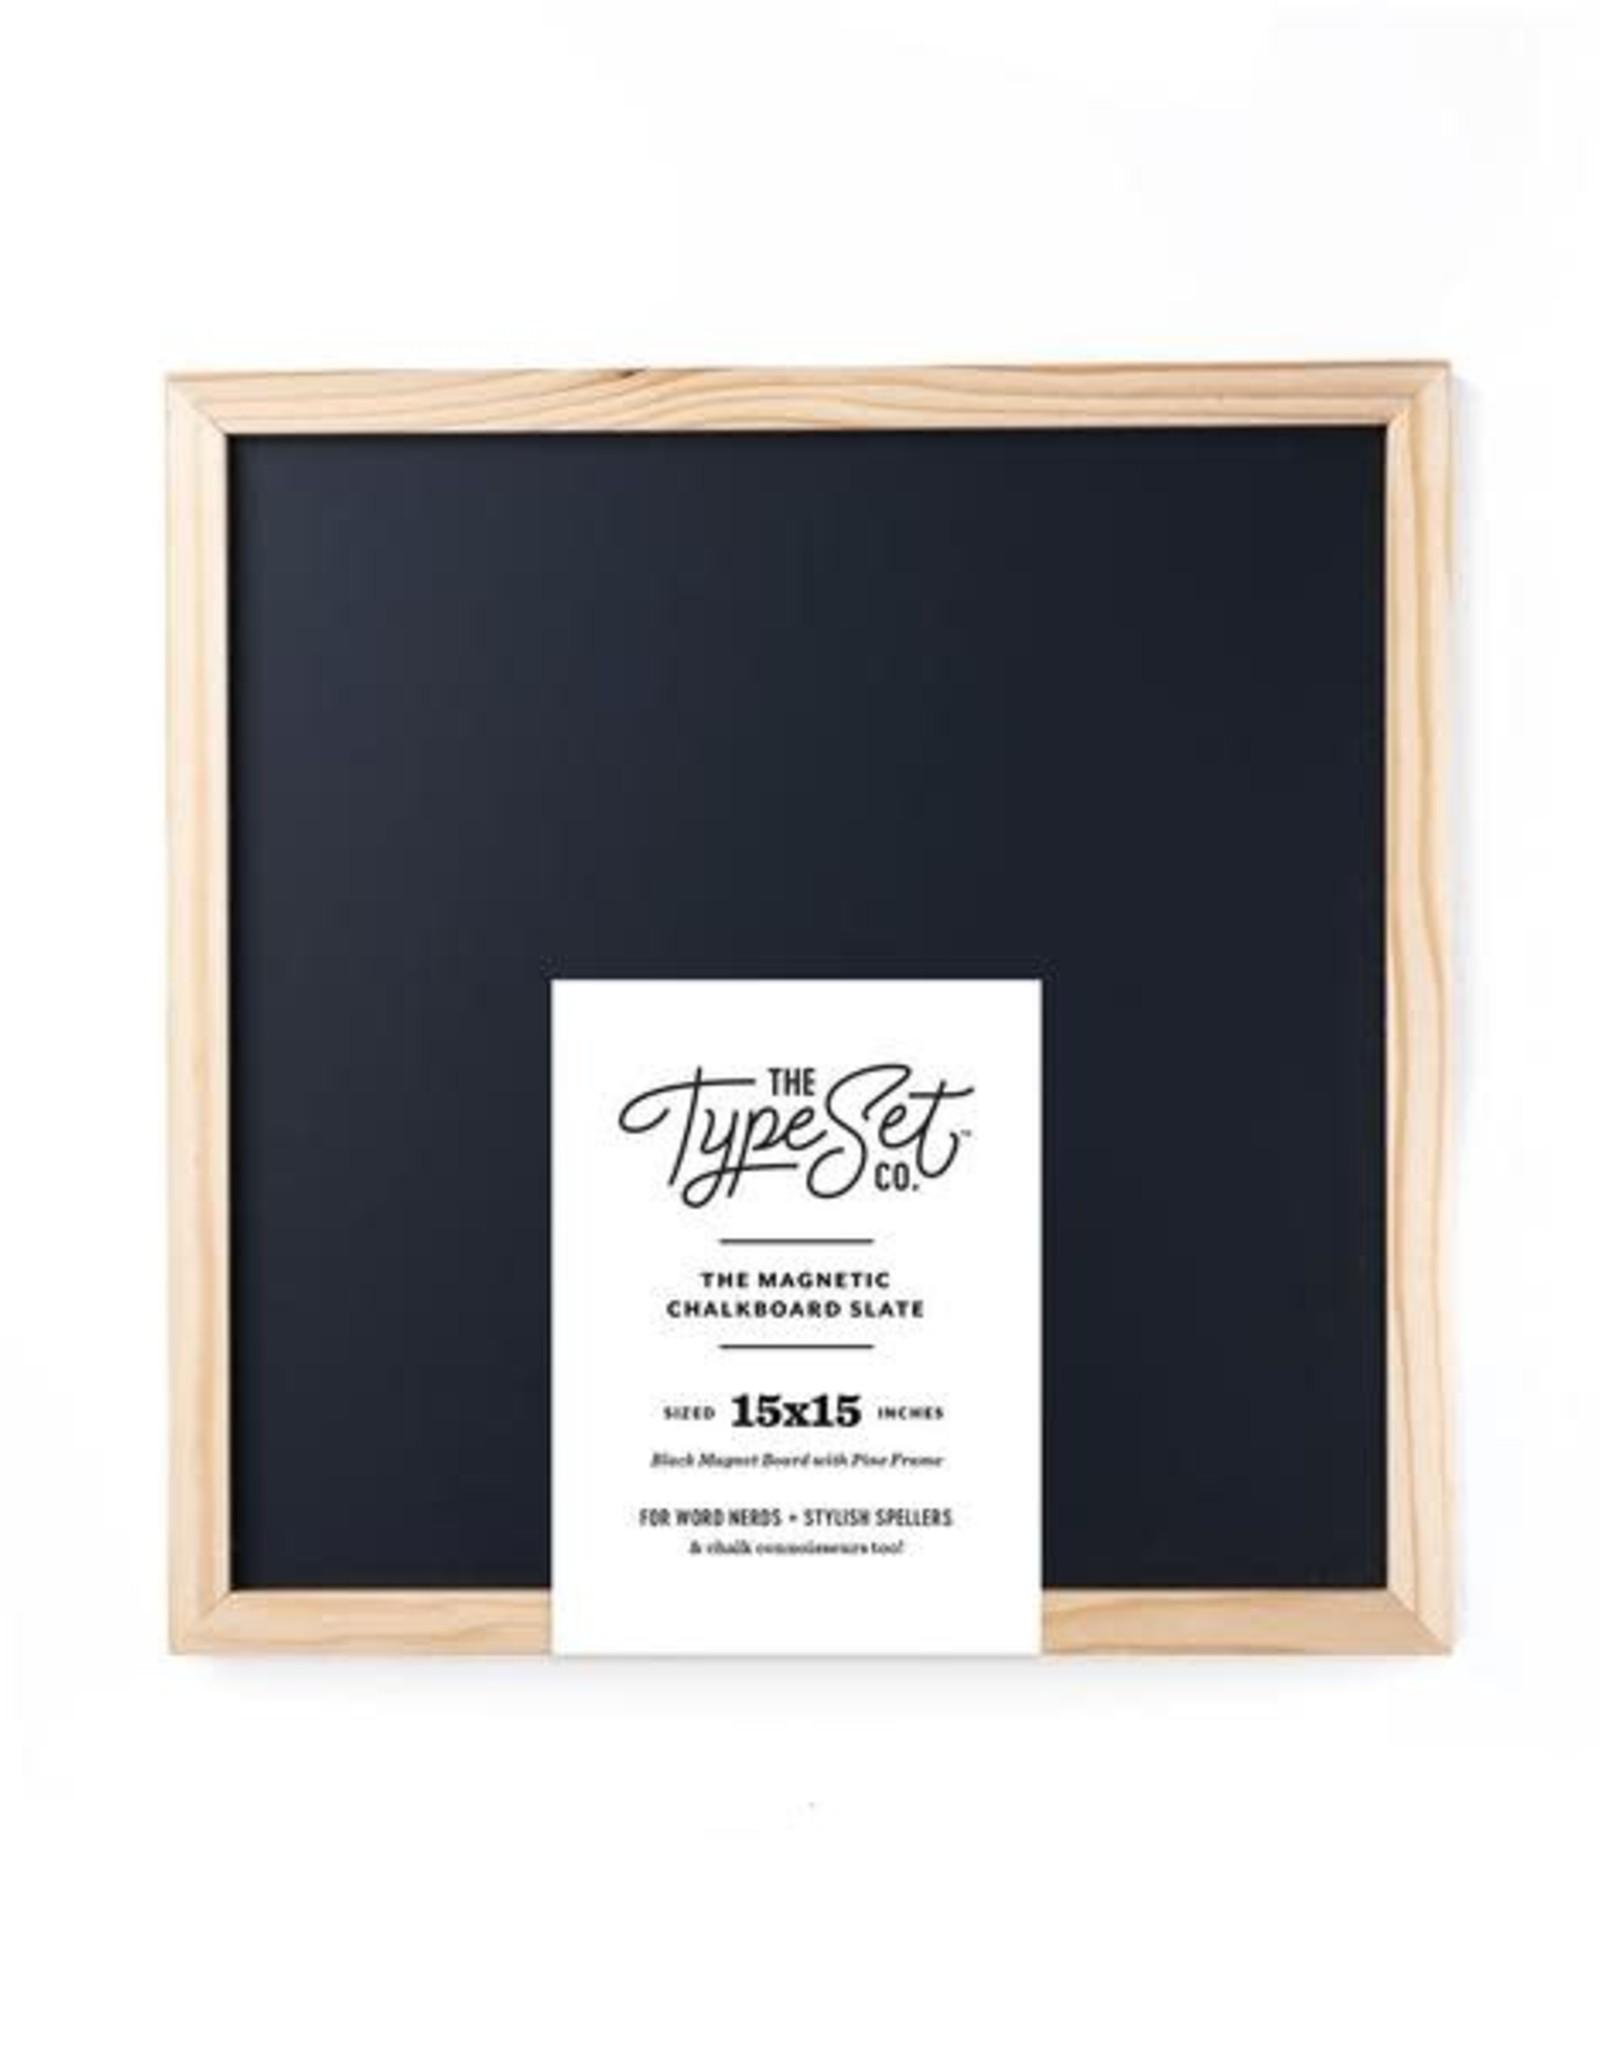 The Type Set Black chalkboard